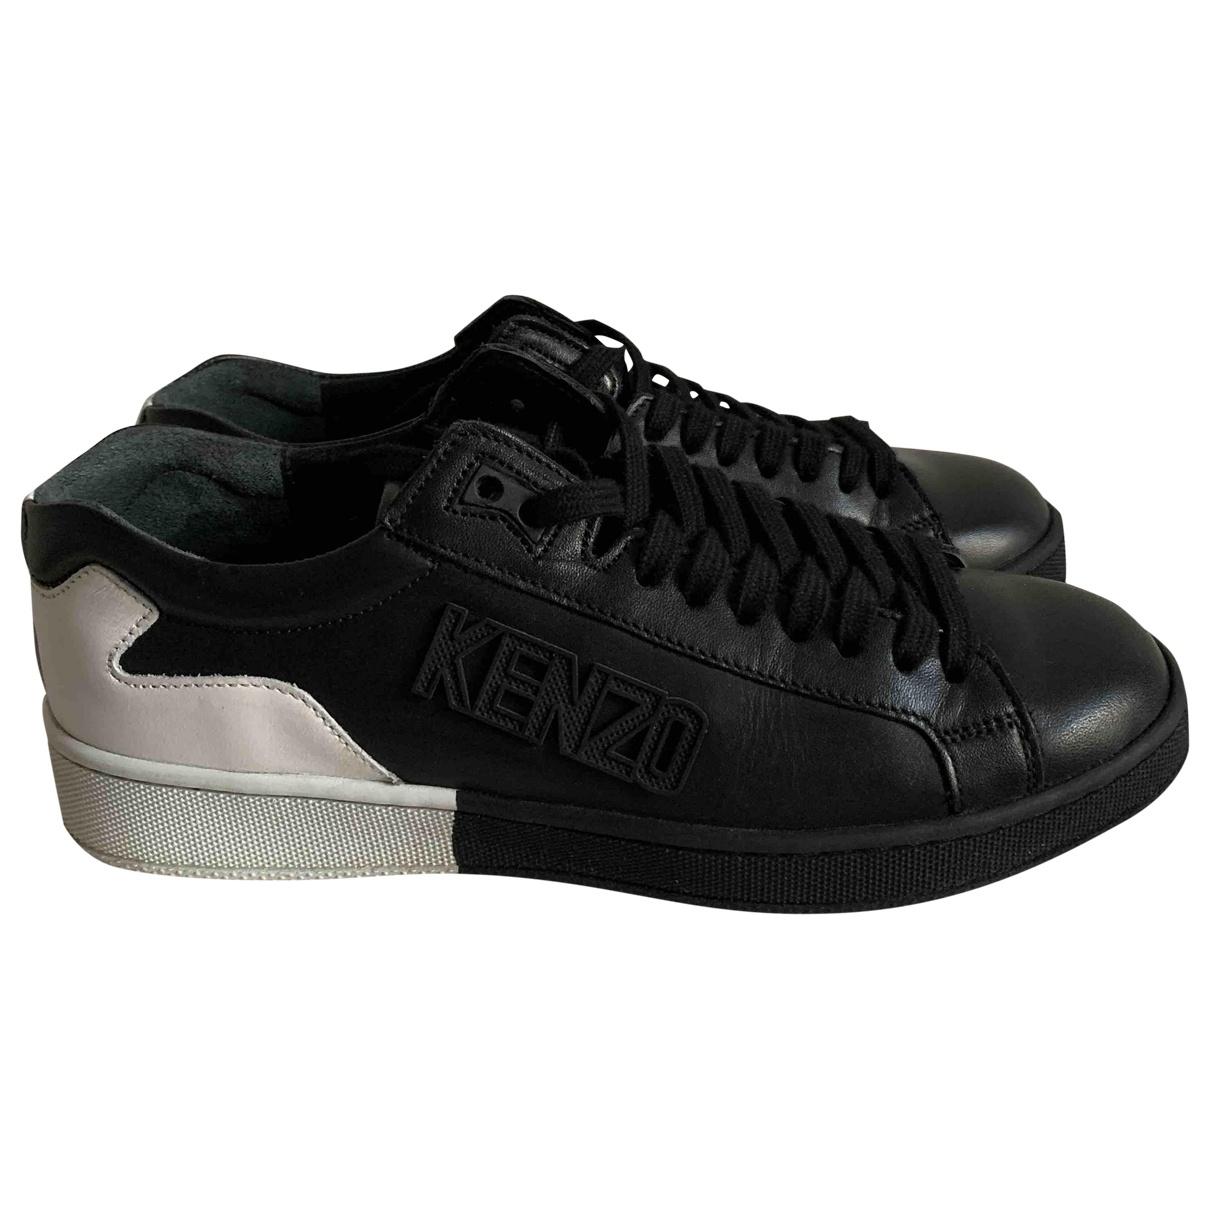 Kenzo \N Black Leather Trainers for Women 36 EU